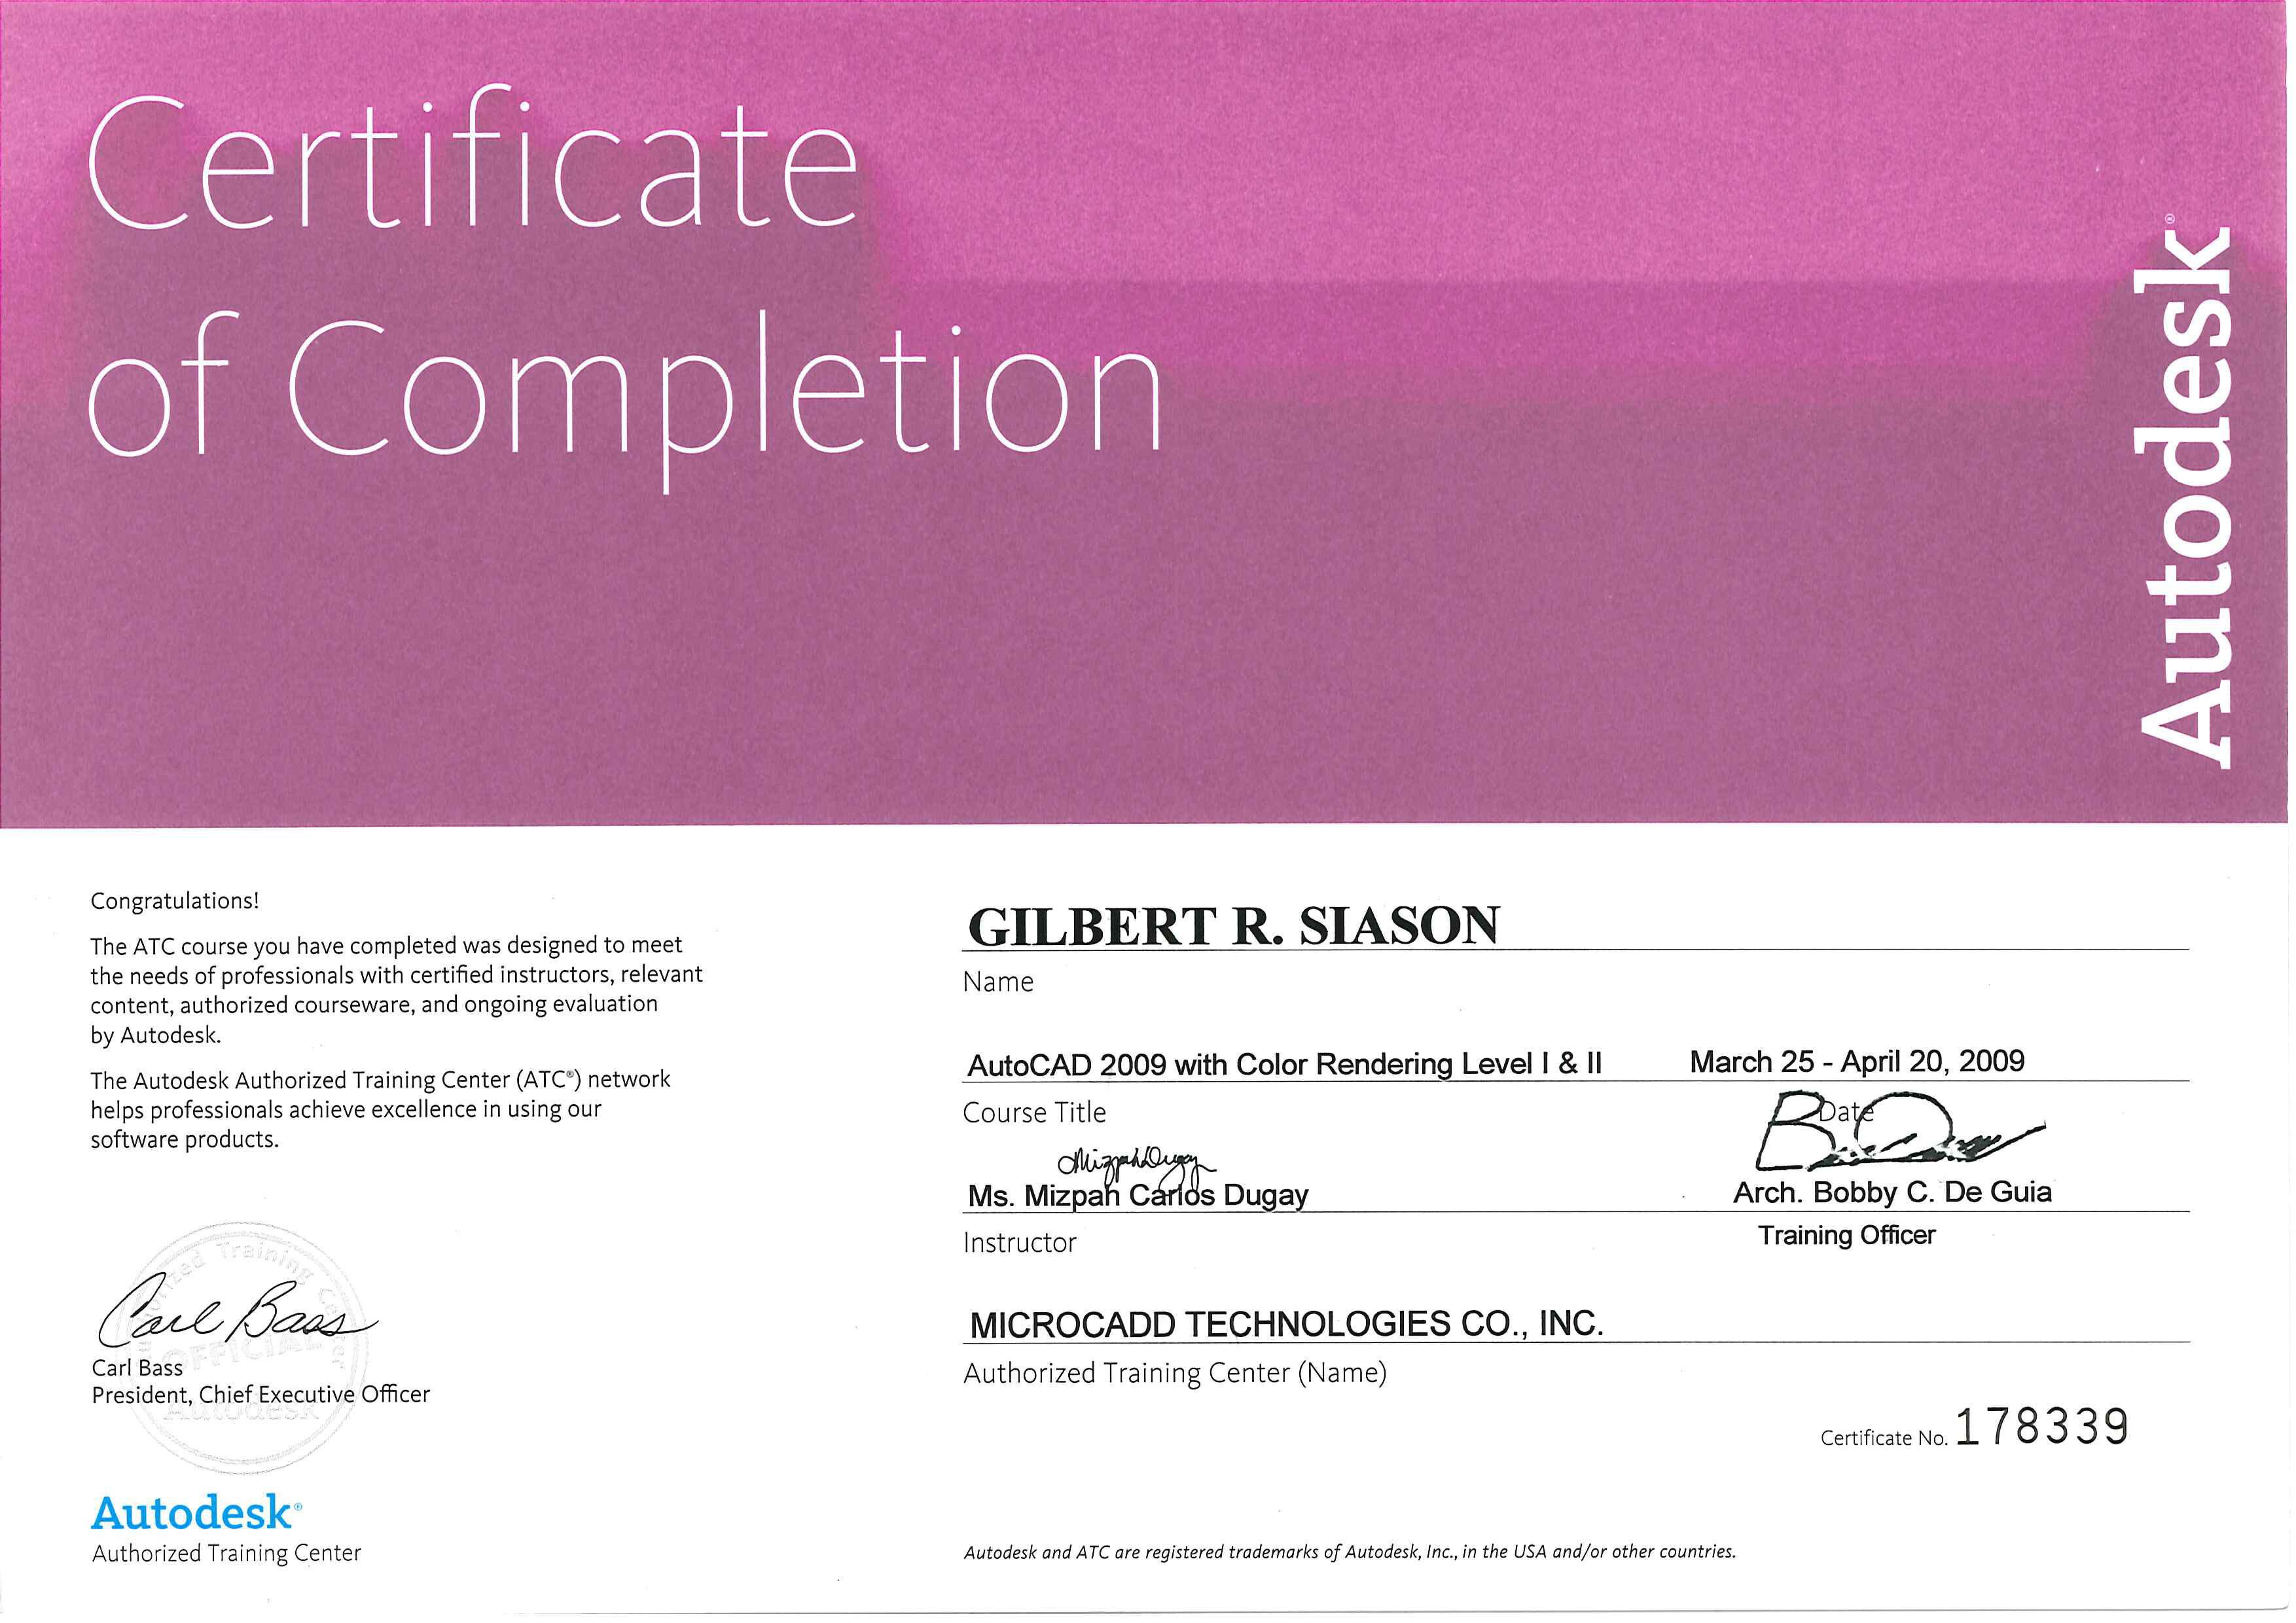 Gilbert siason bayt autocad 2009 w color rendering level i ii certificate xflitez Gallery